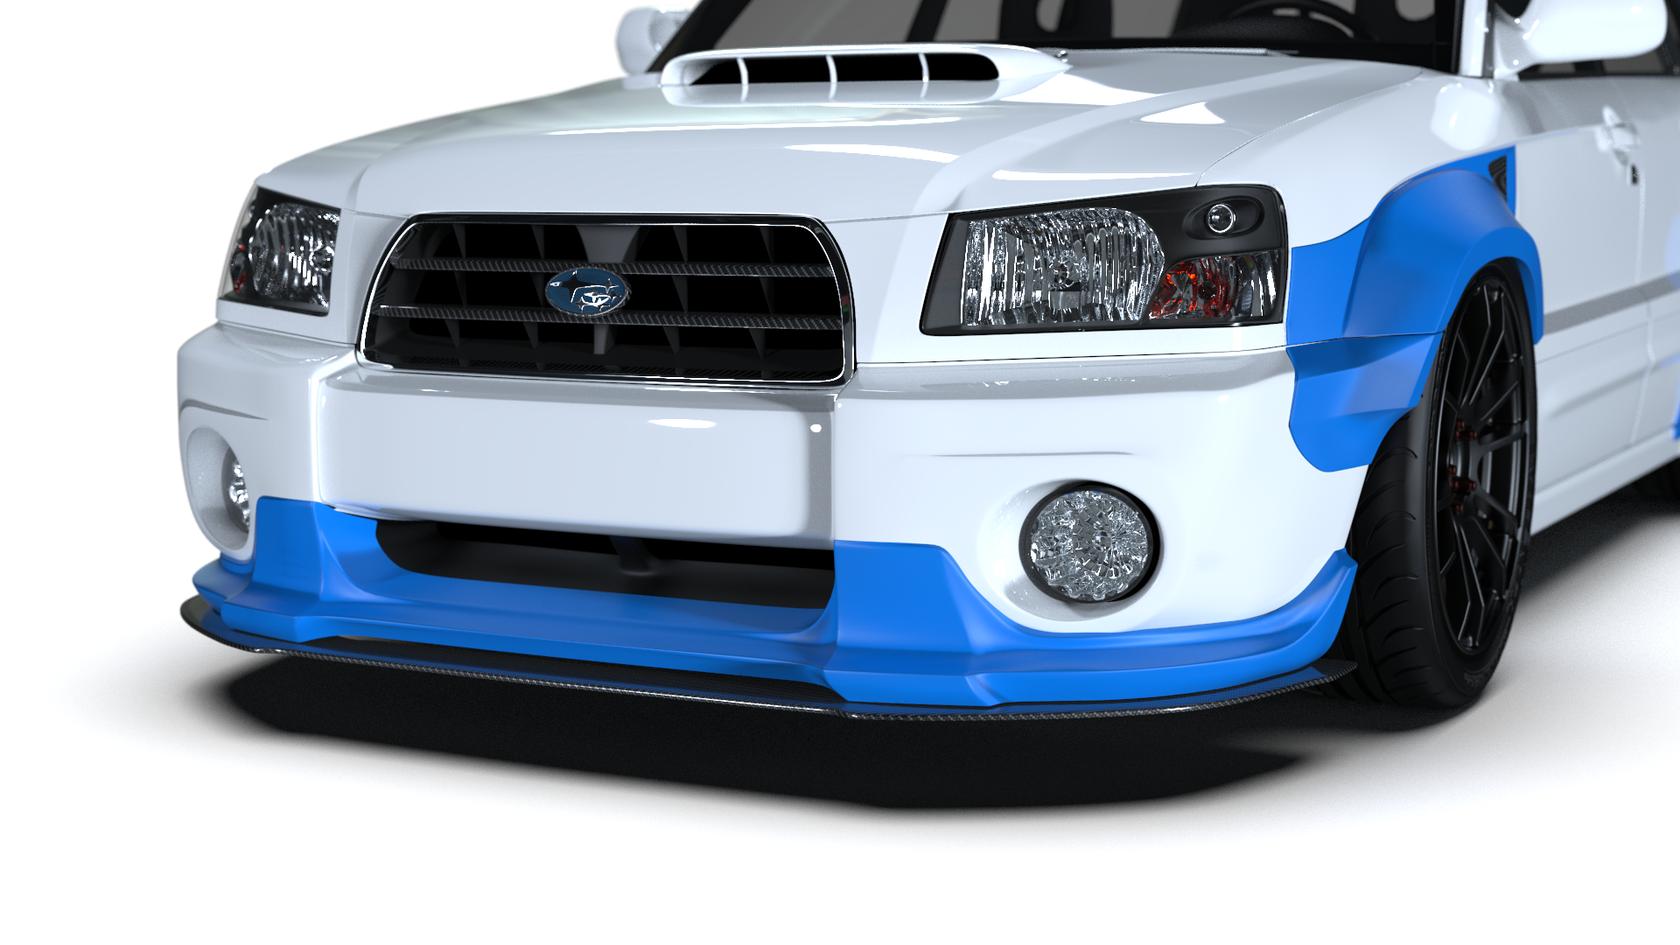 Front Lip Spoiler Subaru Forester Sg5 02 05 Subaru Forester Subaru Subaru Forester Xt